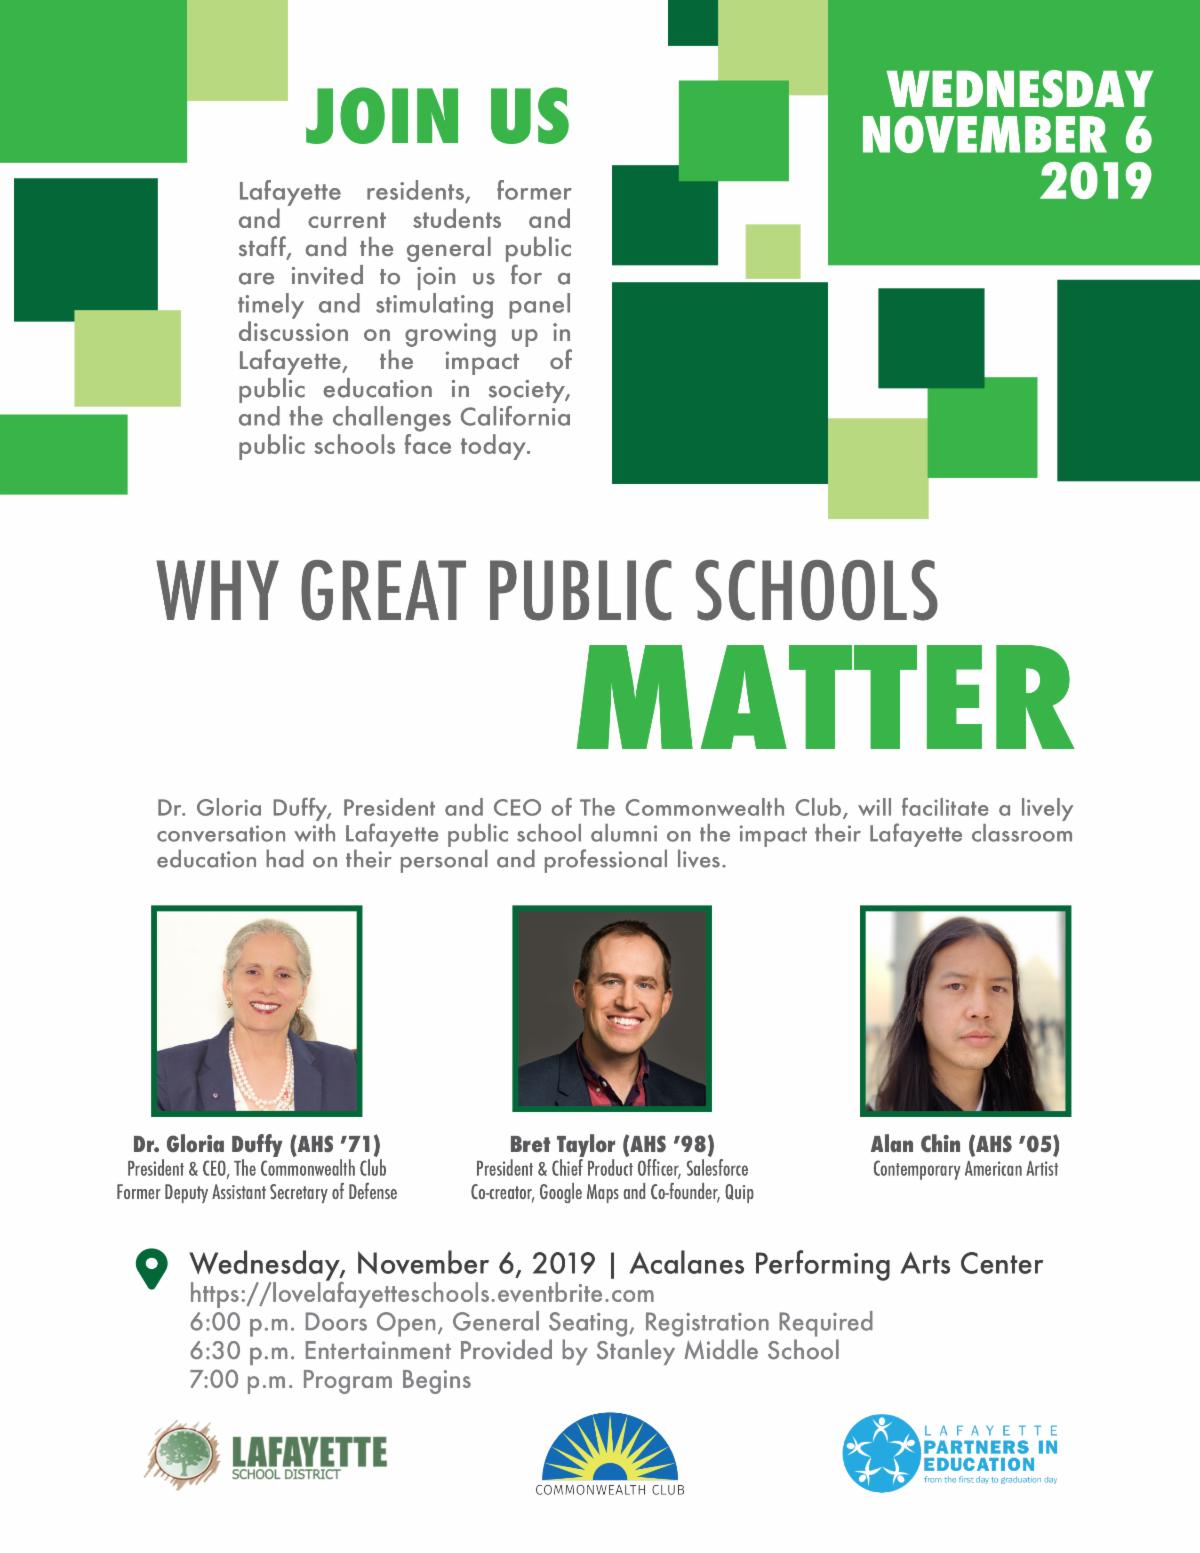 Why Great Schools Matter - November 6